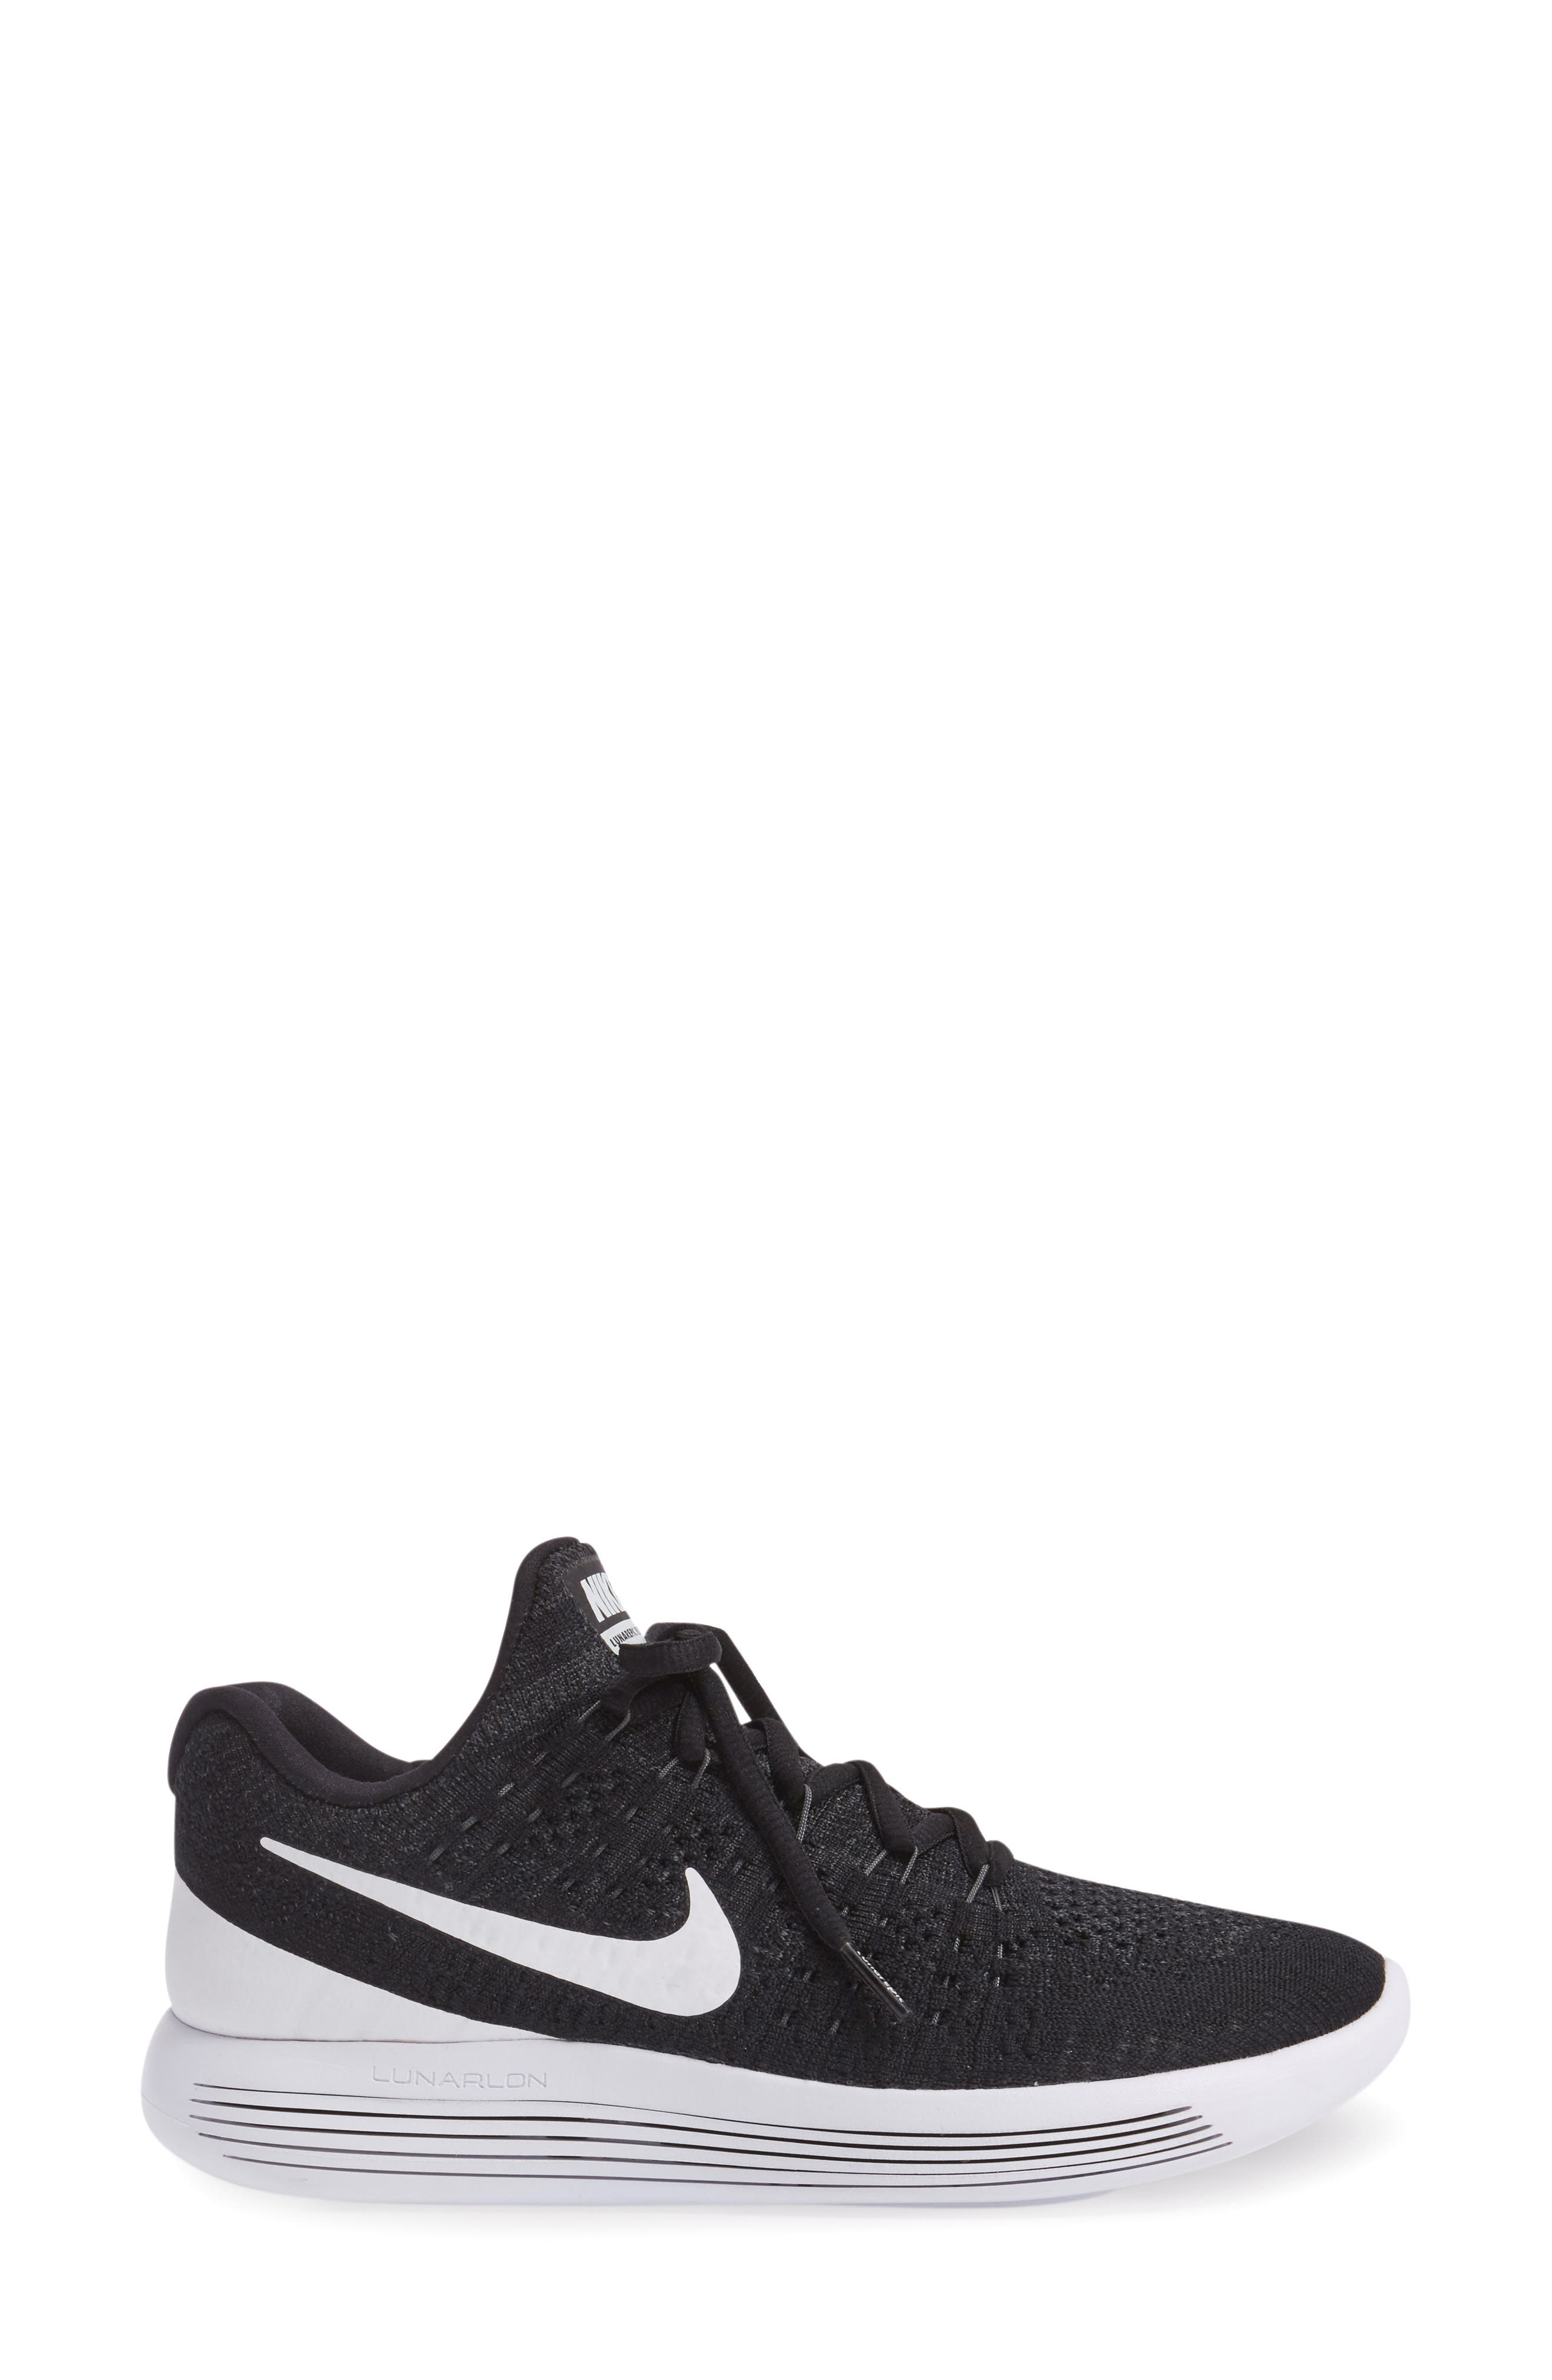 Alternate Image 3  - Nike LunarEpic Low Flyknit 2 Running Shoe (Women)